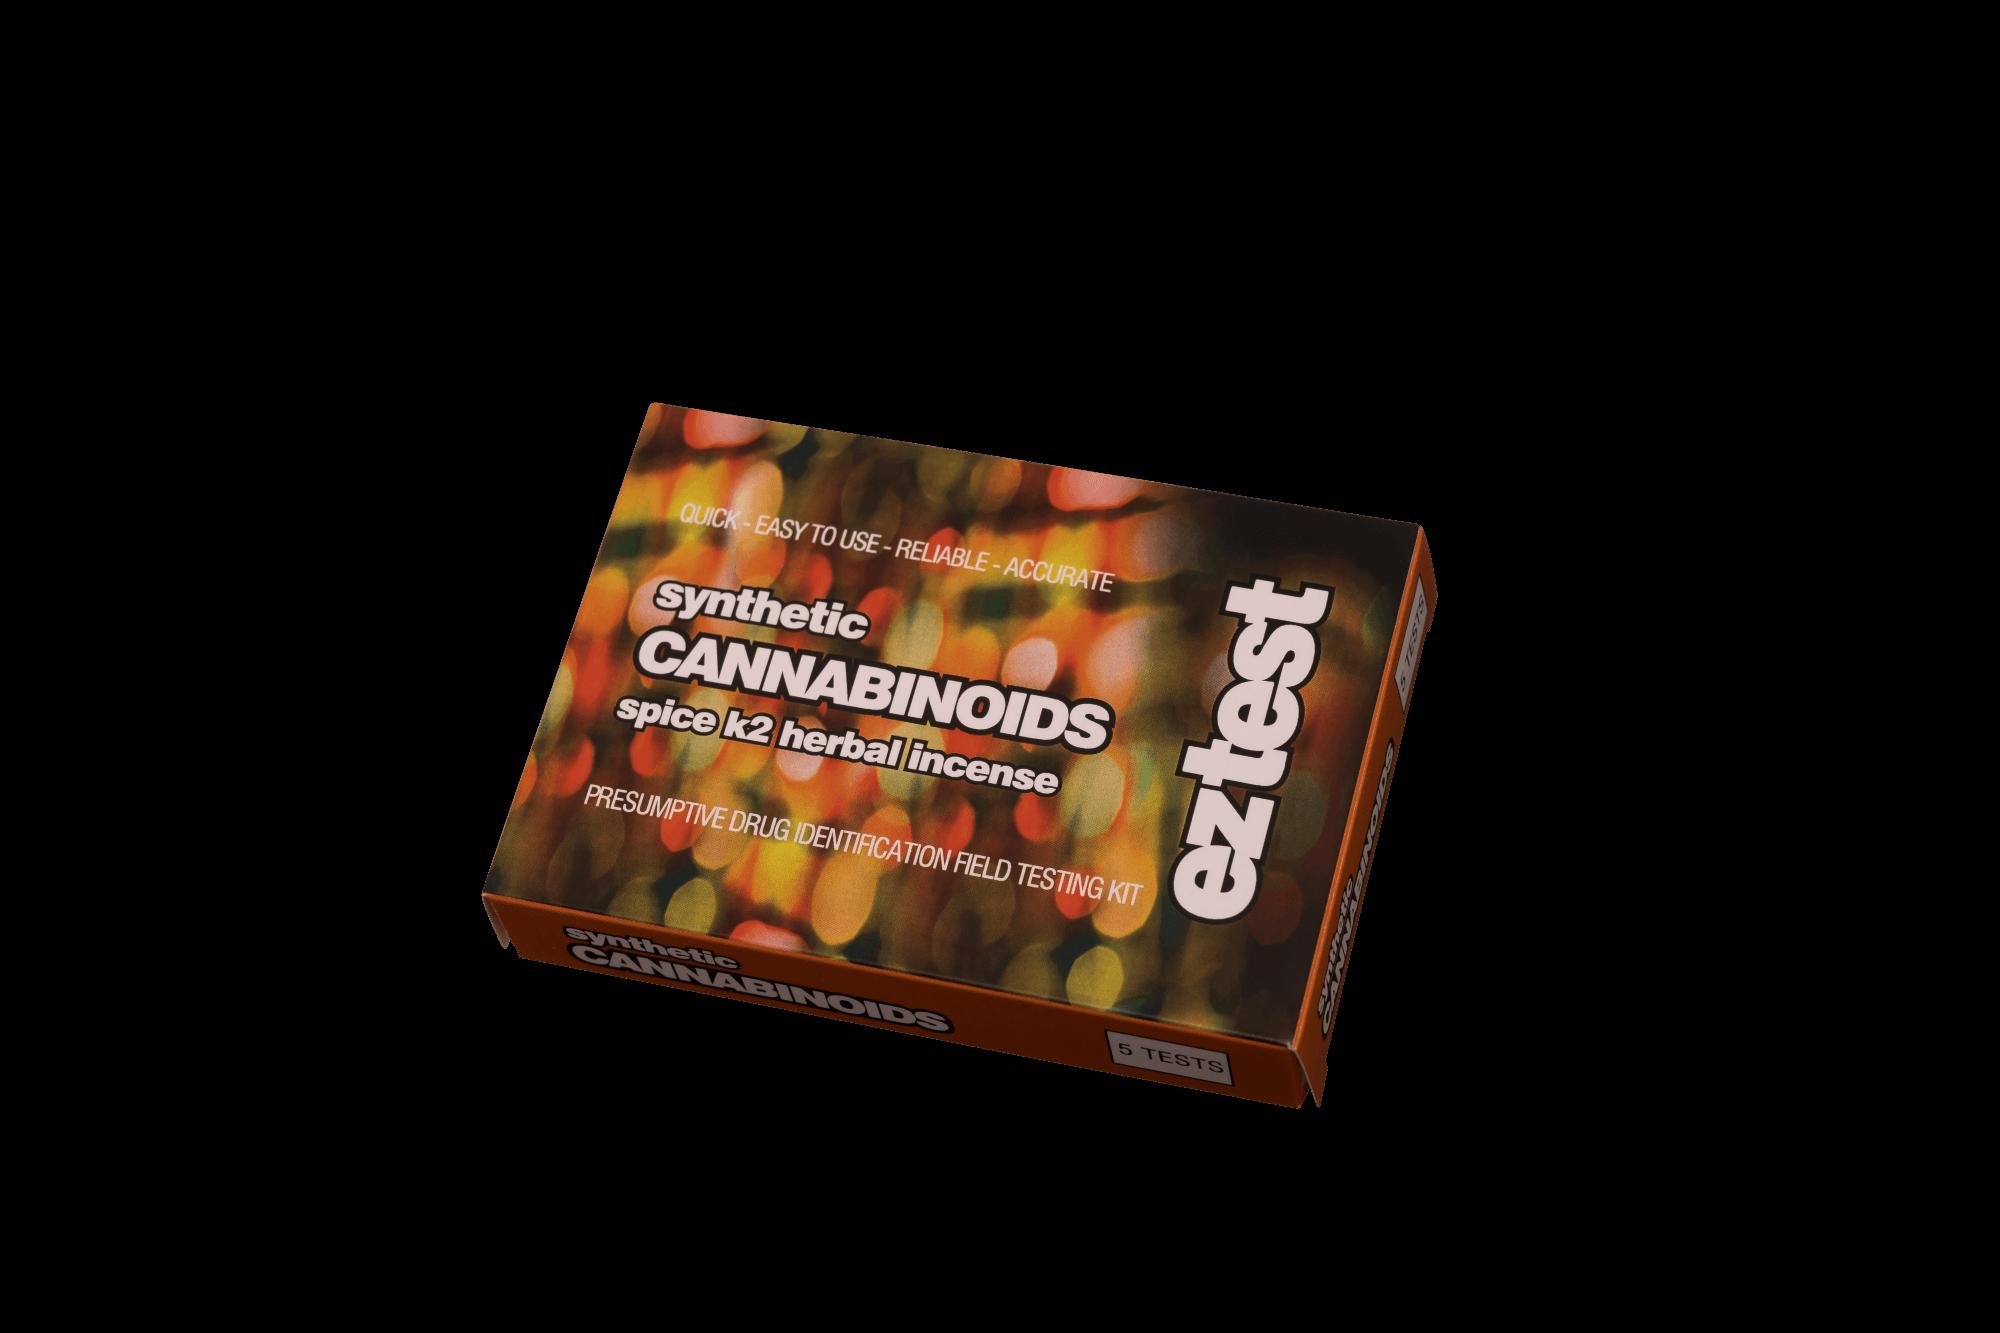 Synthetic Cannabinoids 5 Use Drug Testing Kit